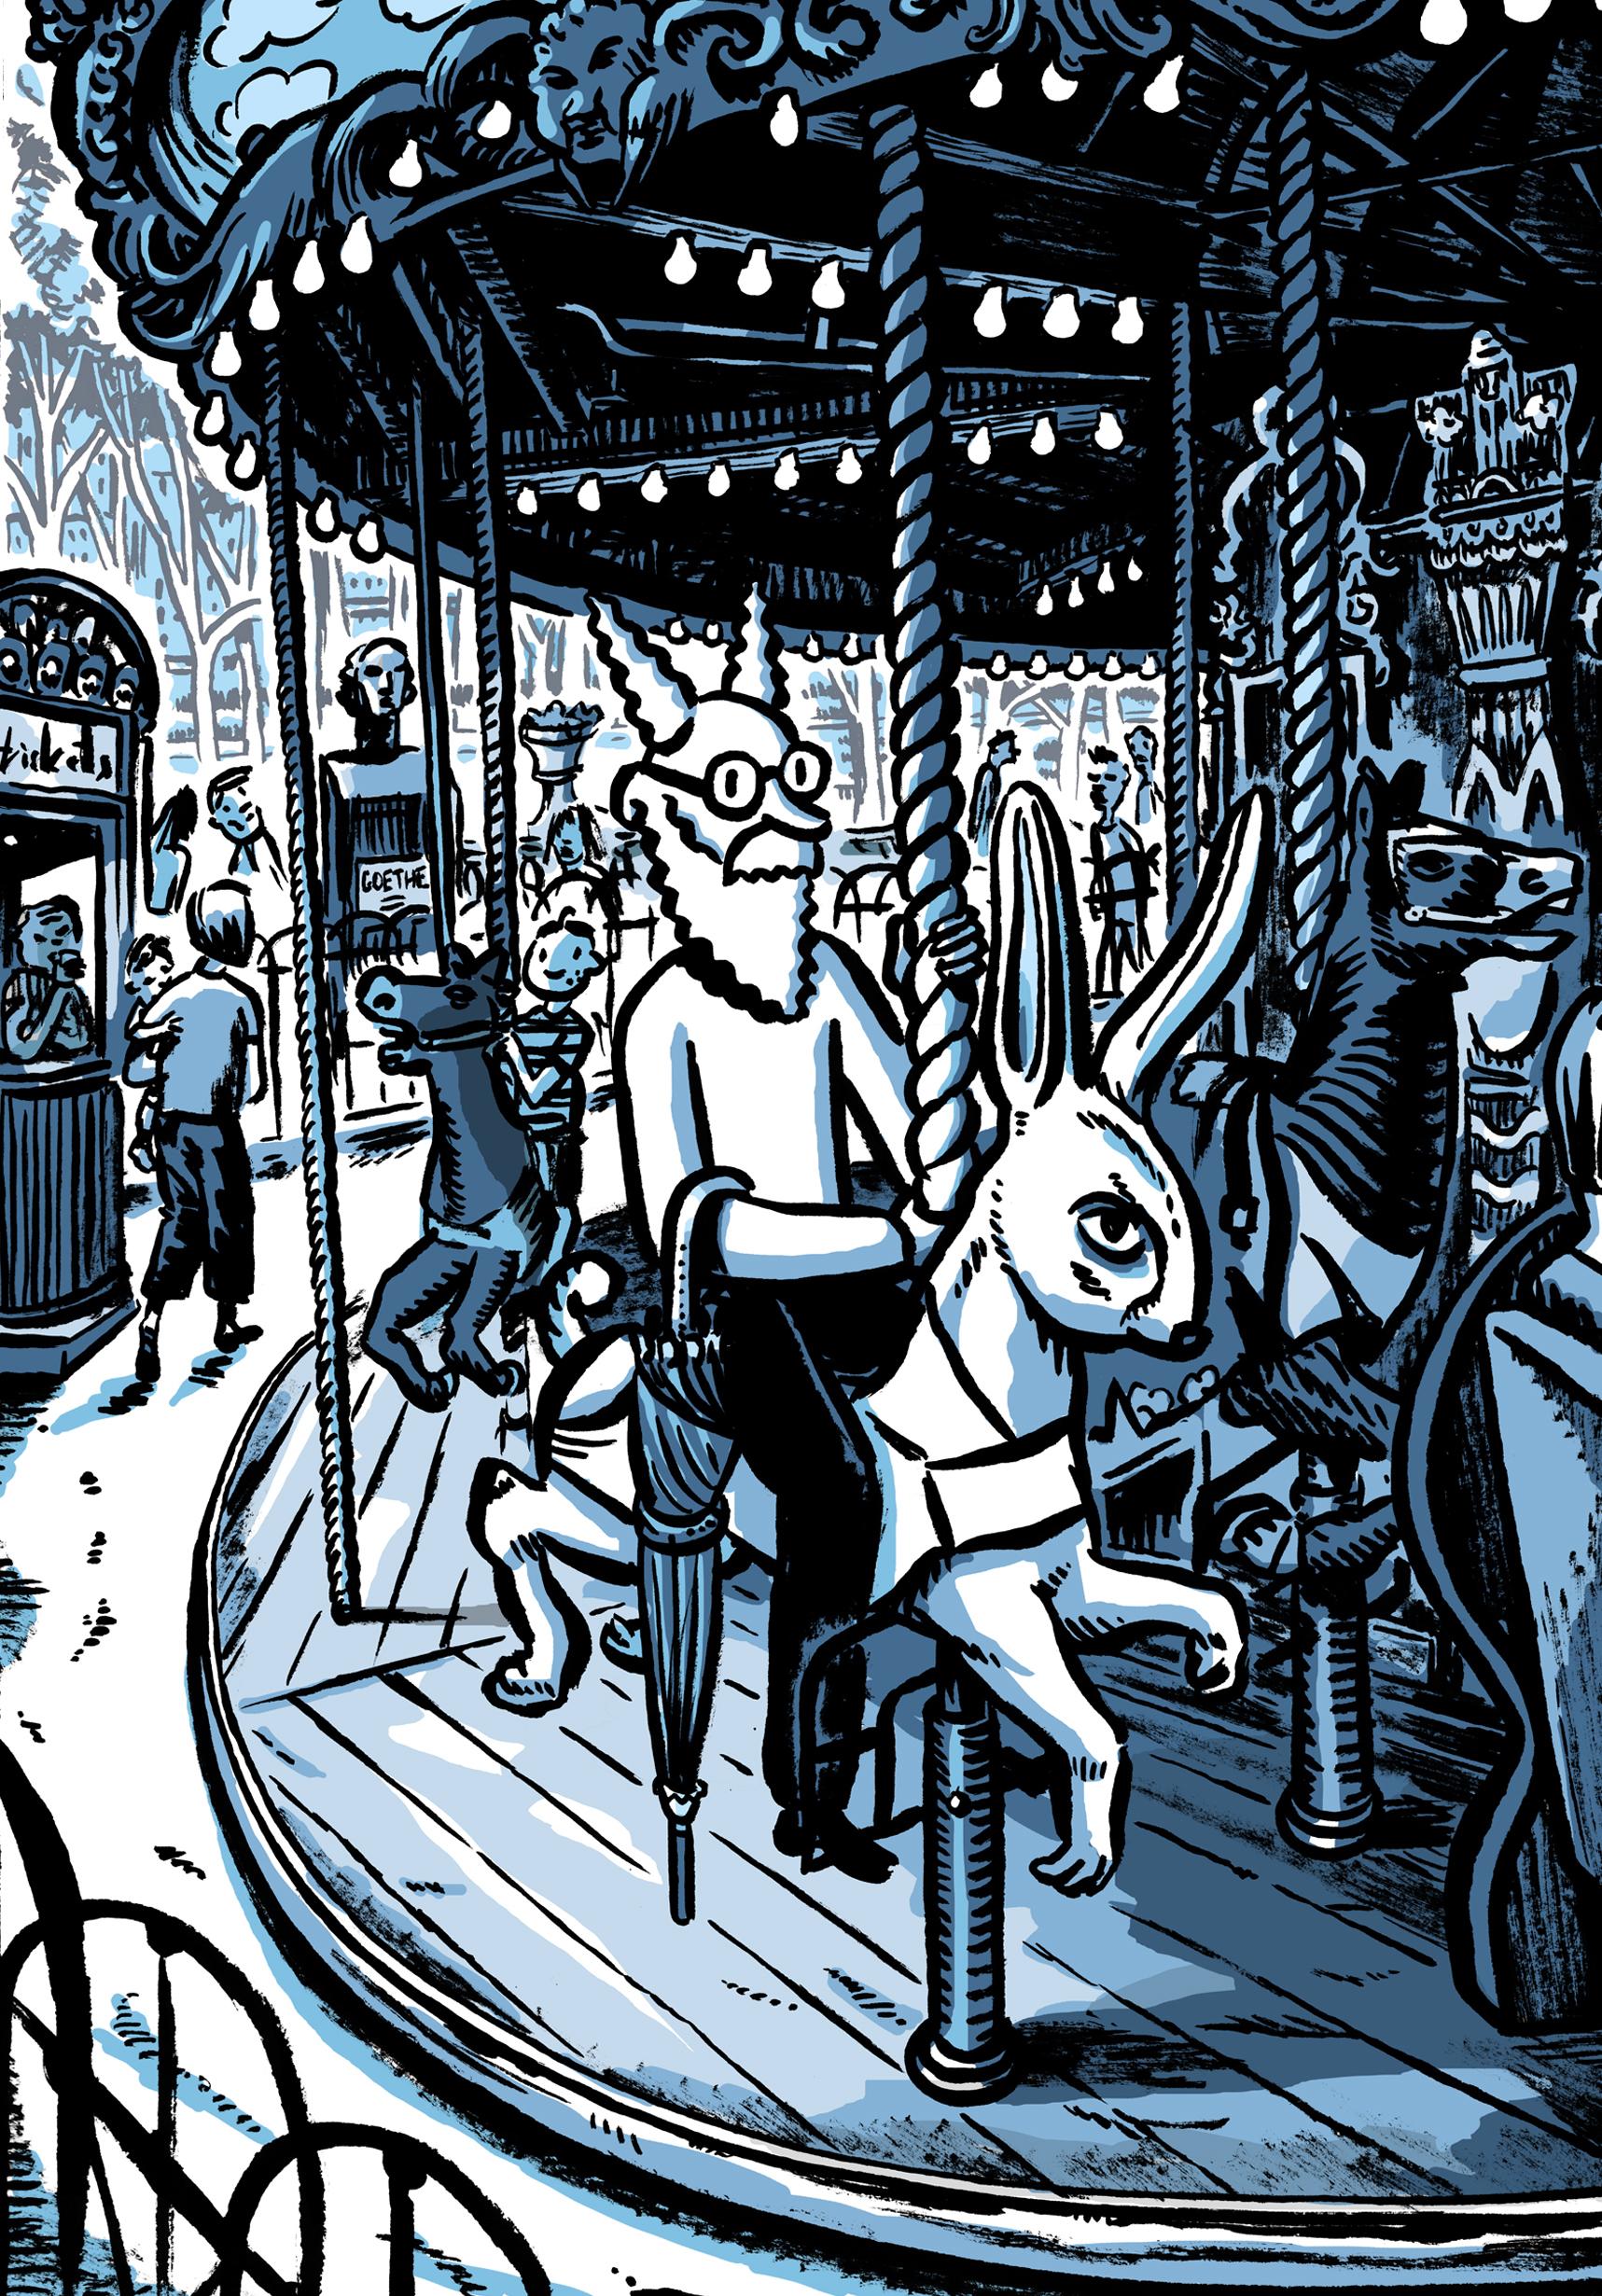 Nimbus on the Carousel of Disgruntled Animals.